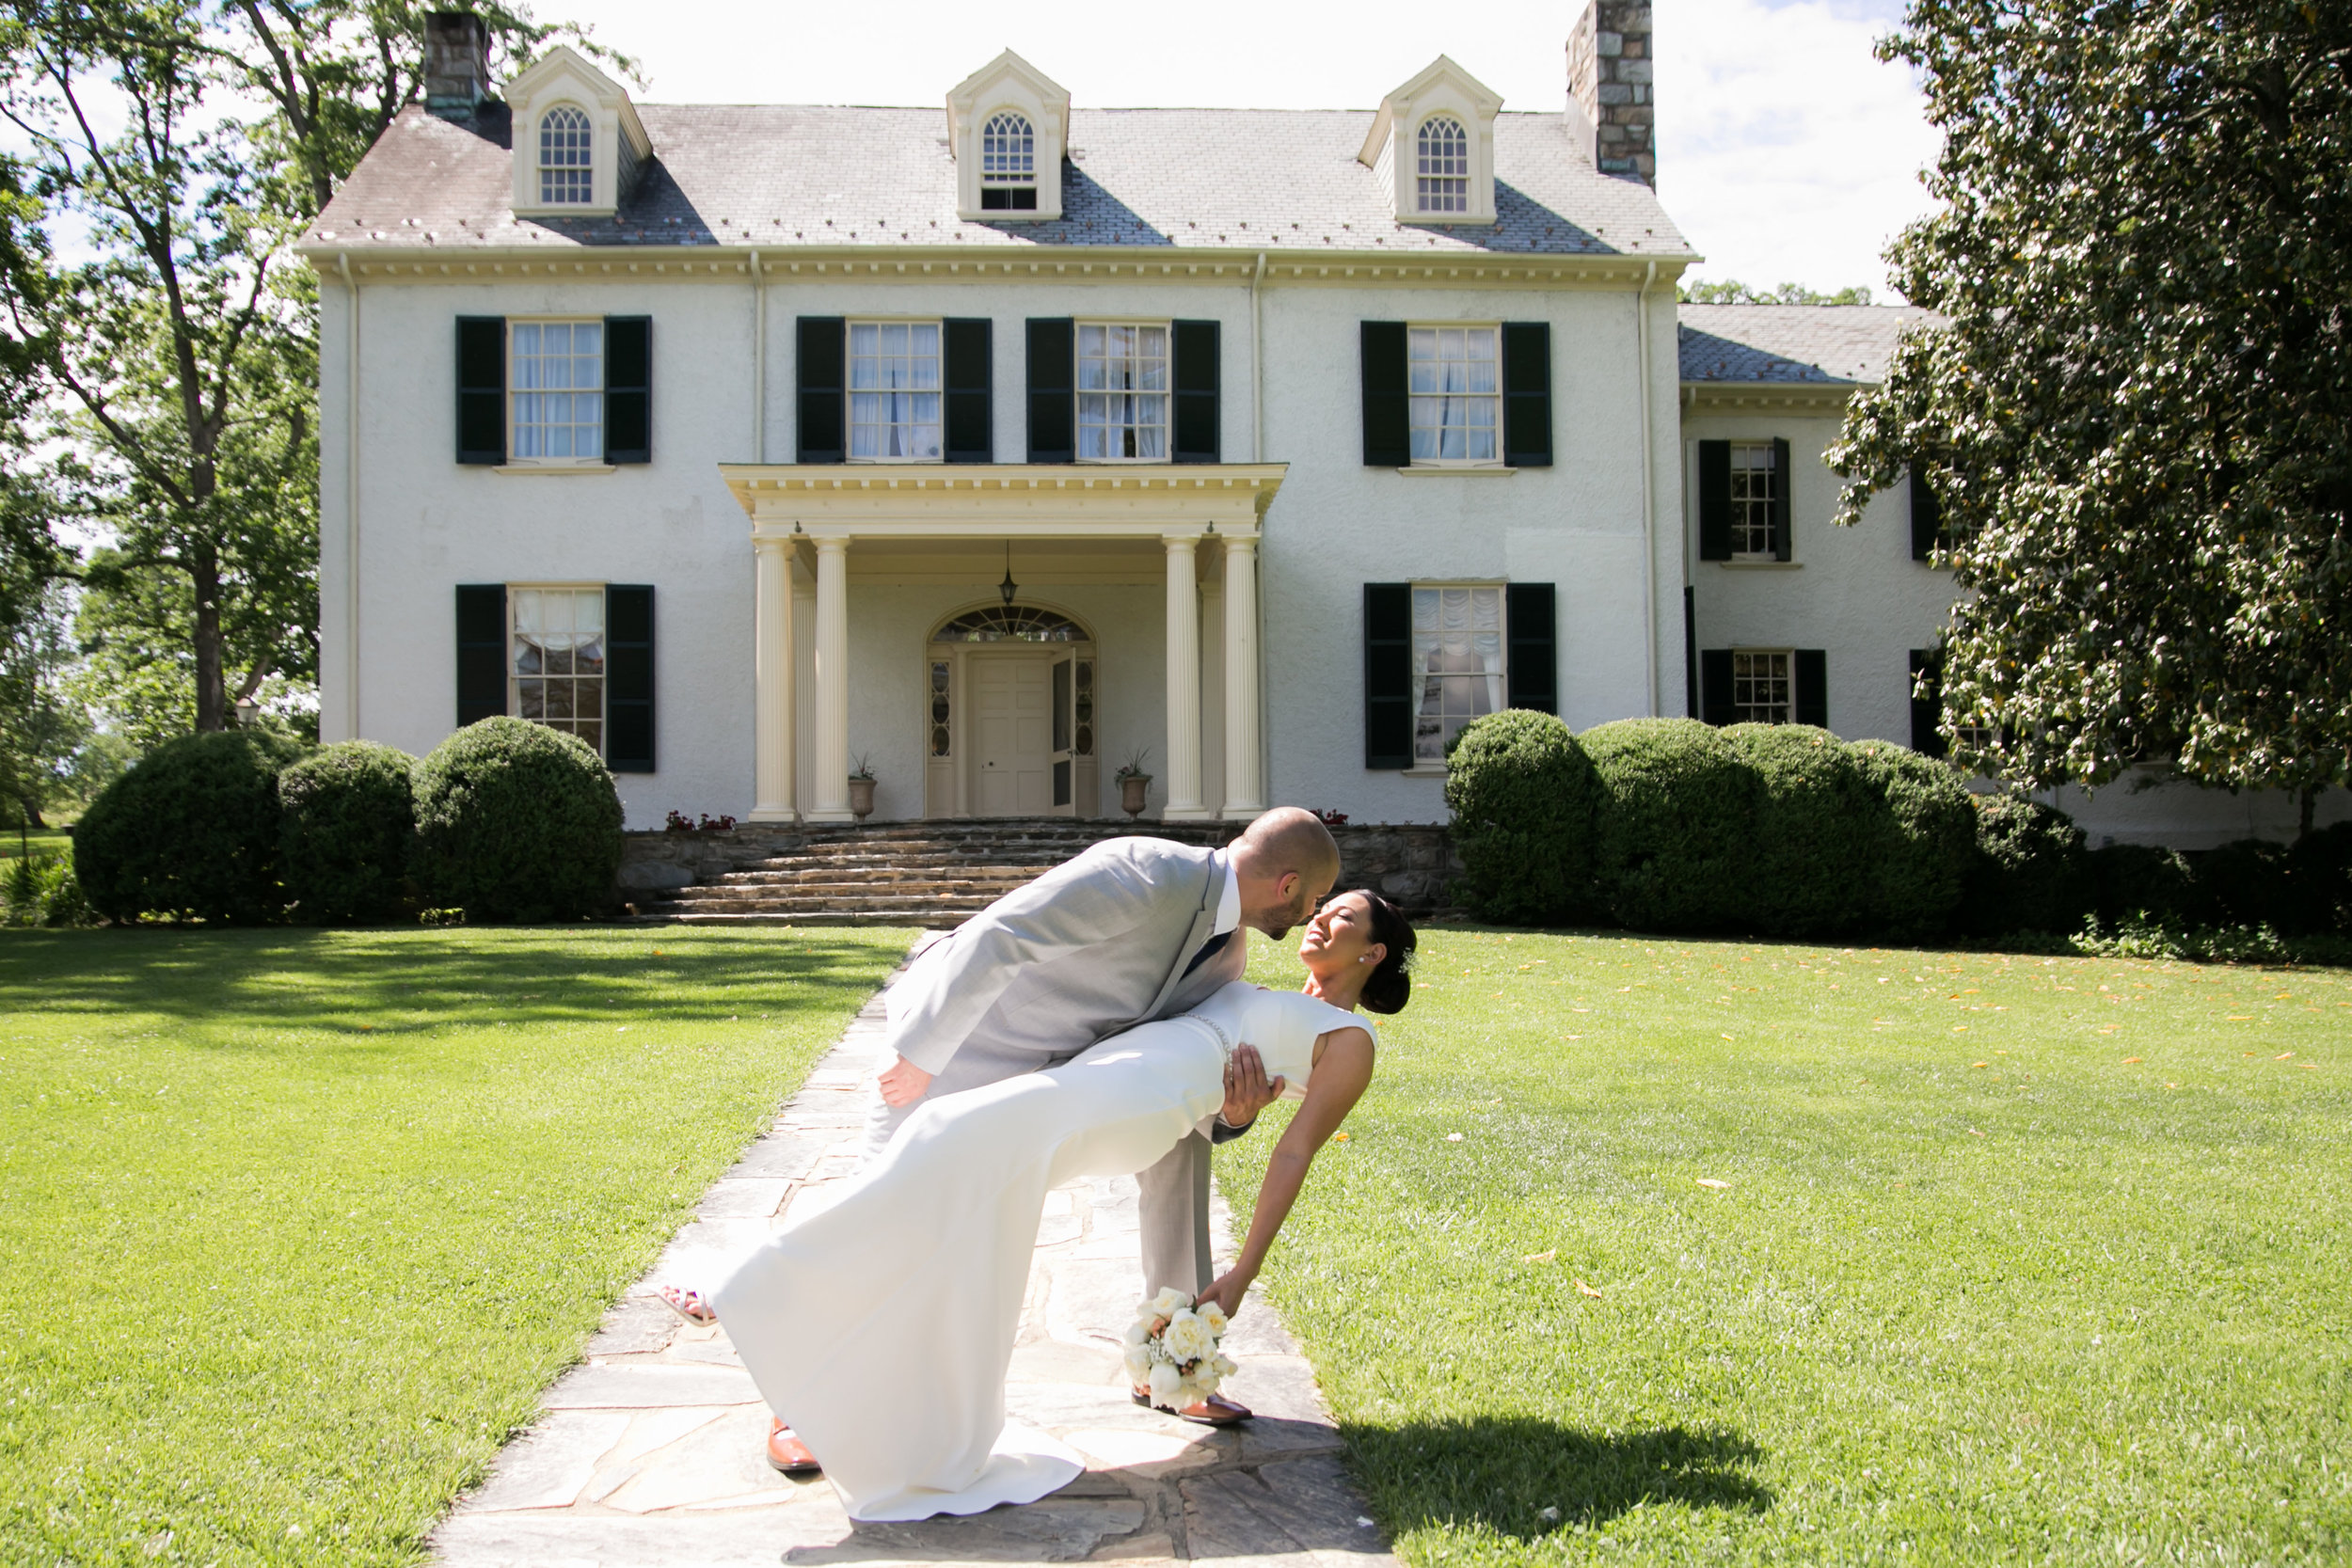 Pure elegance events Tynise Kee dc wedding planner va wedding planner rust manor house leesburg -0019.jpg